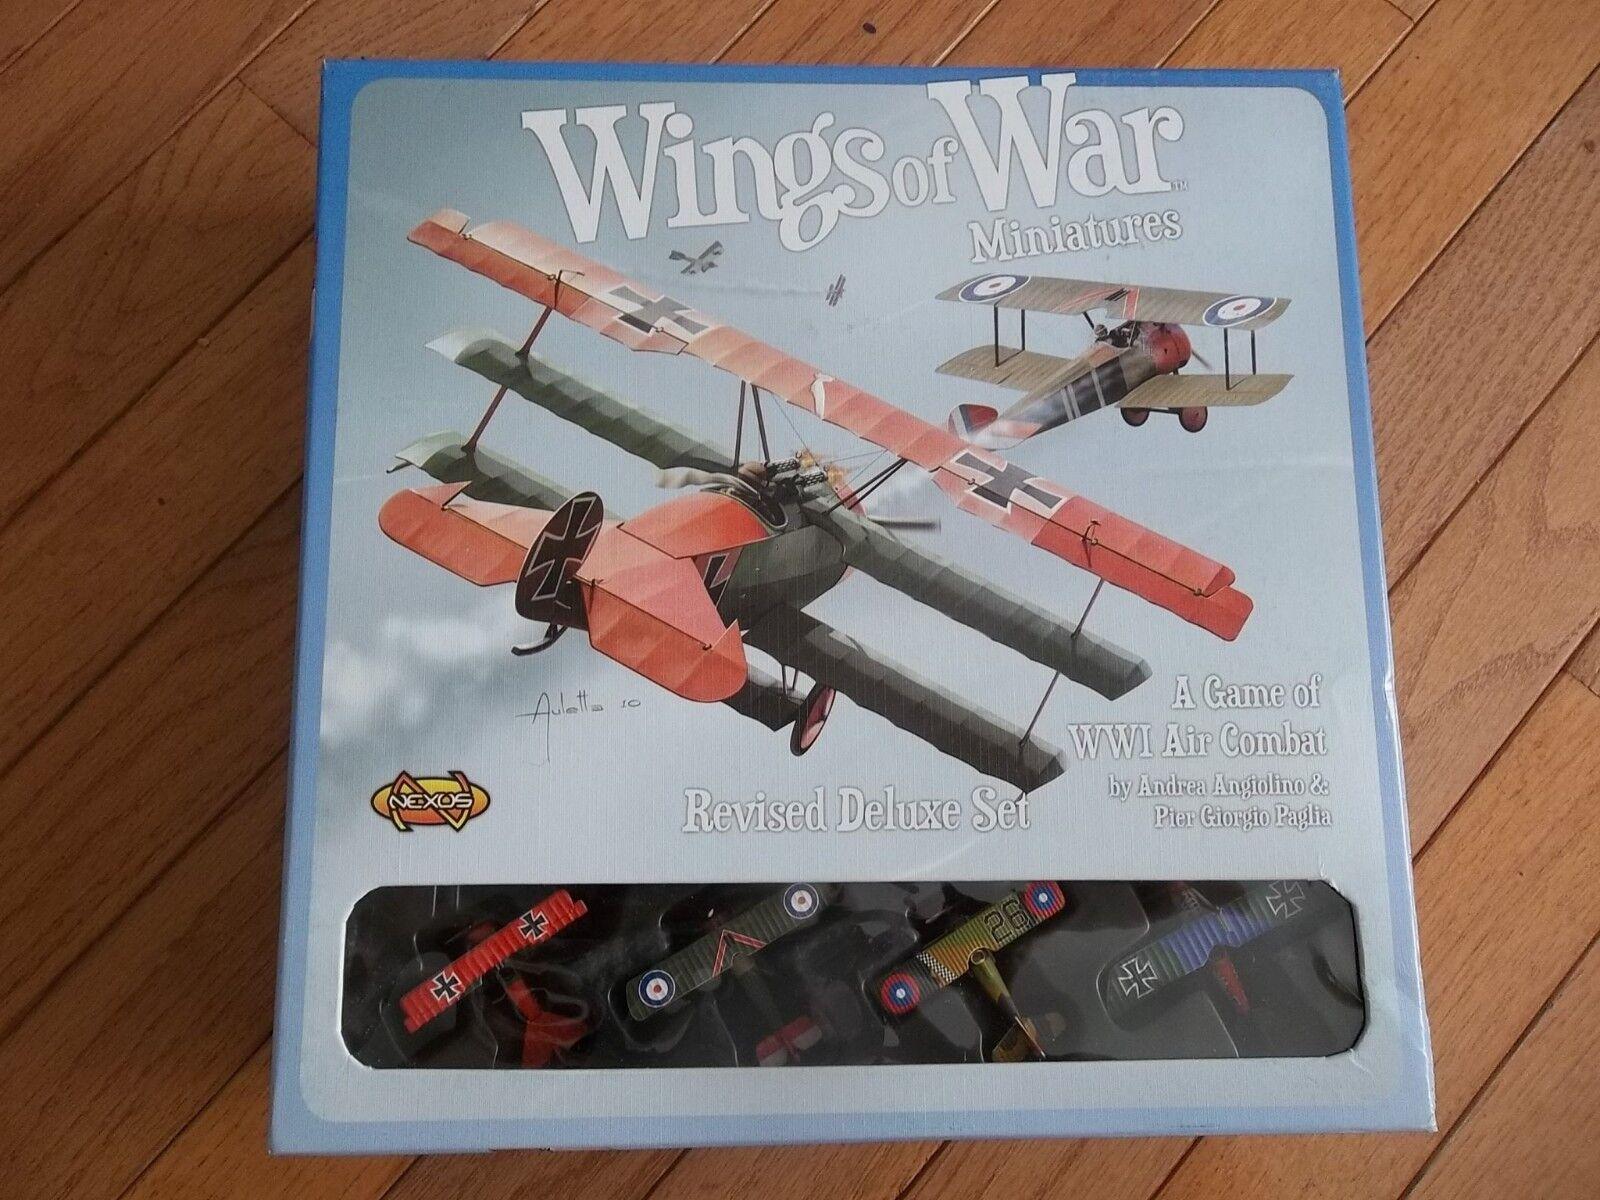 Nexus Wings of War Revised Deluxe Set unpunched